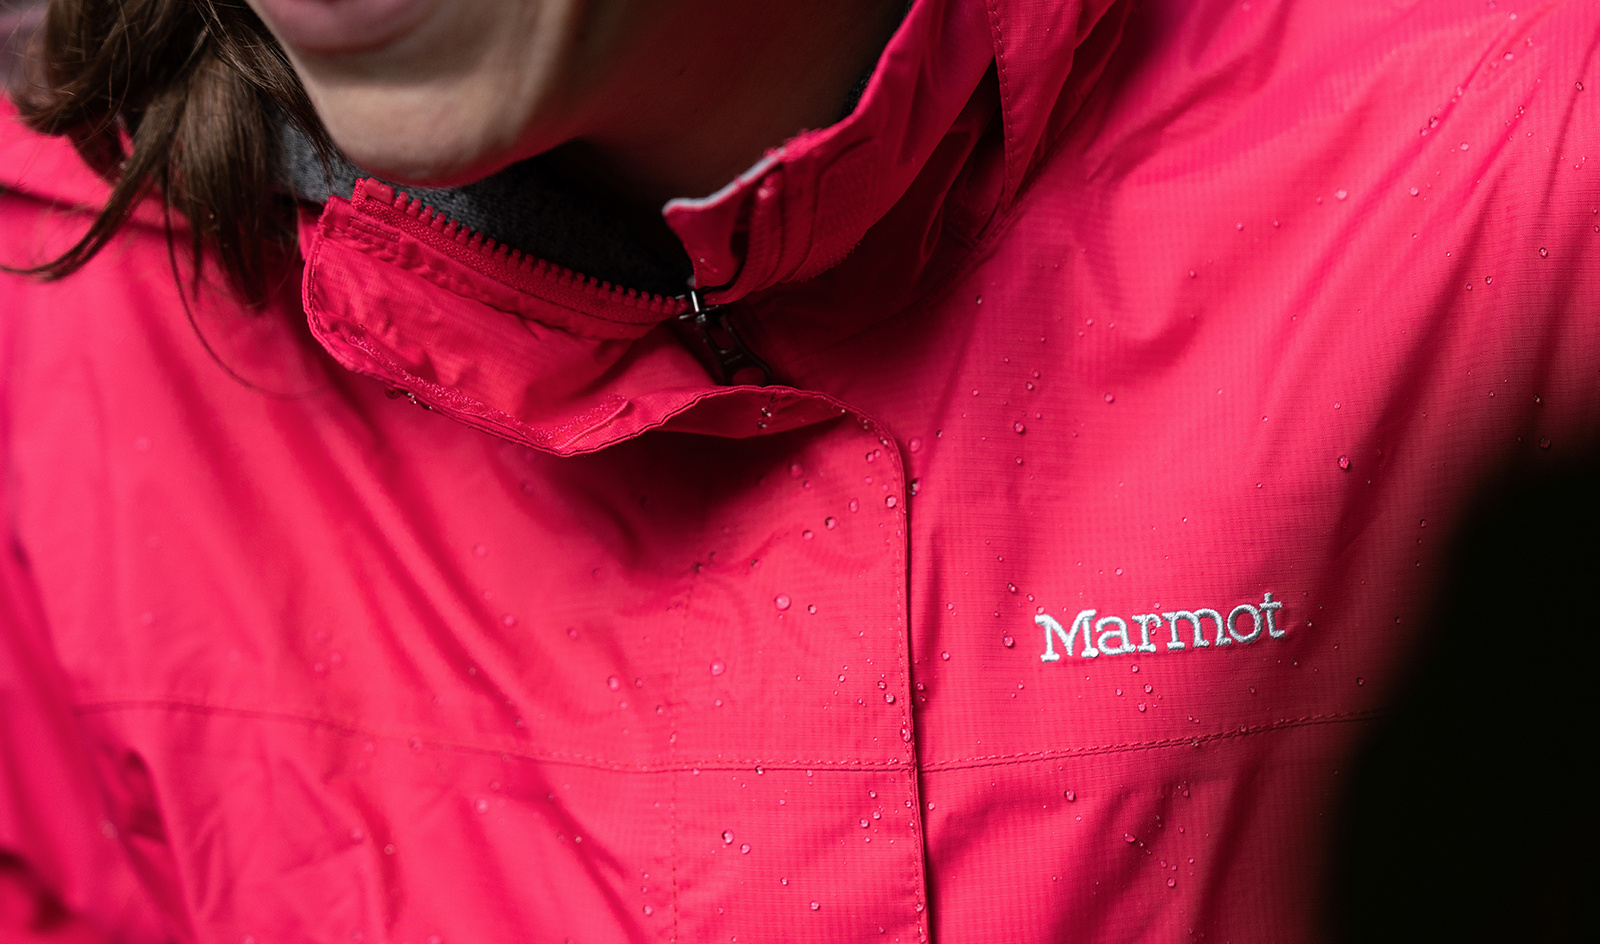 Marmot - Outdoor Clothing & Gear